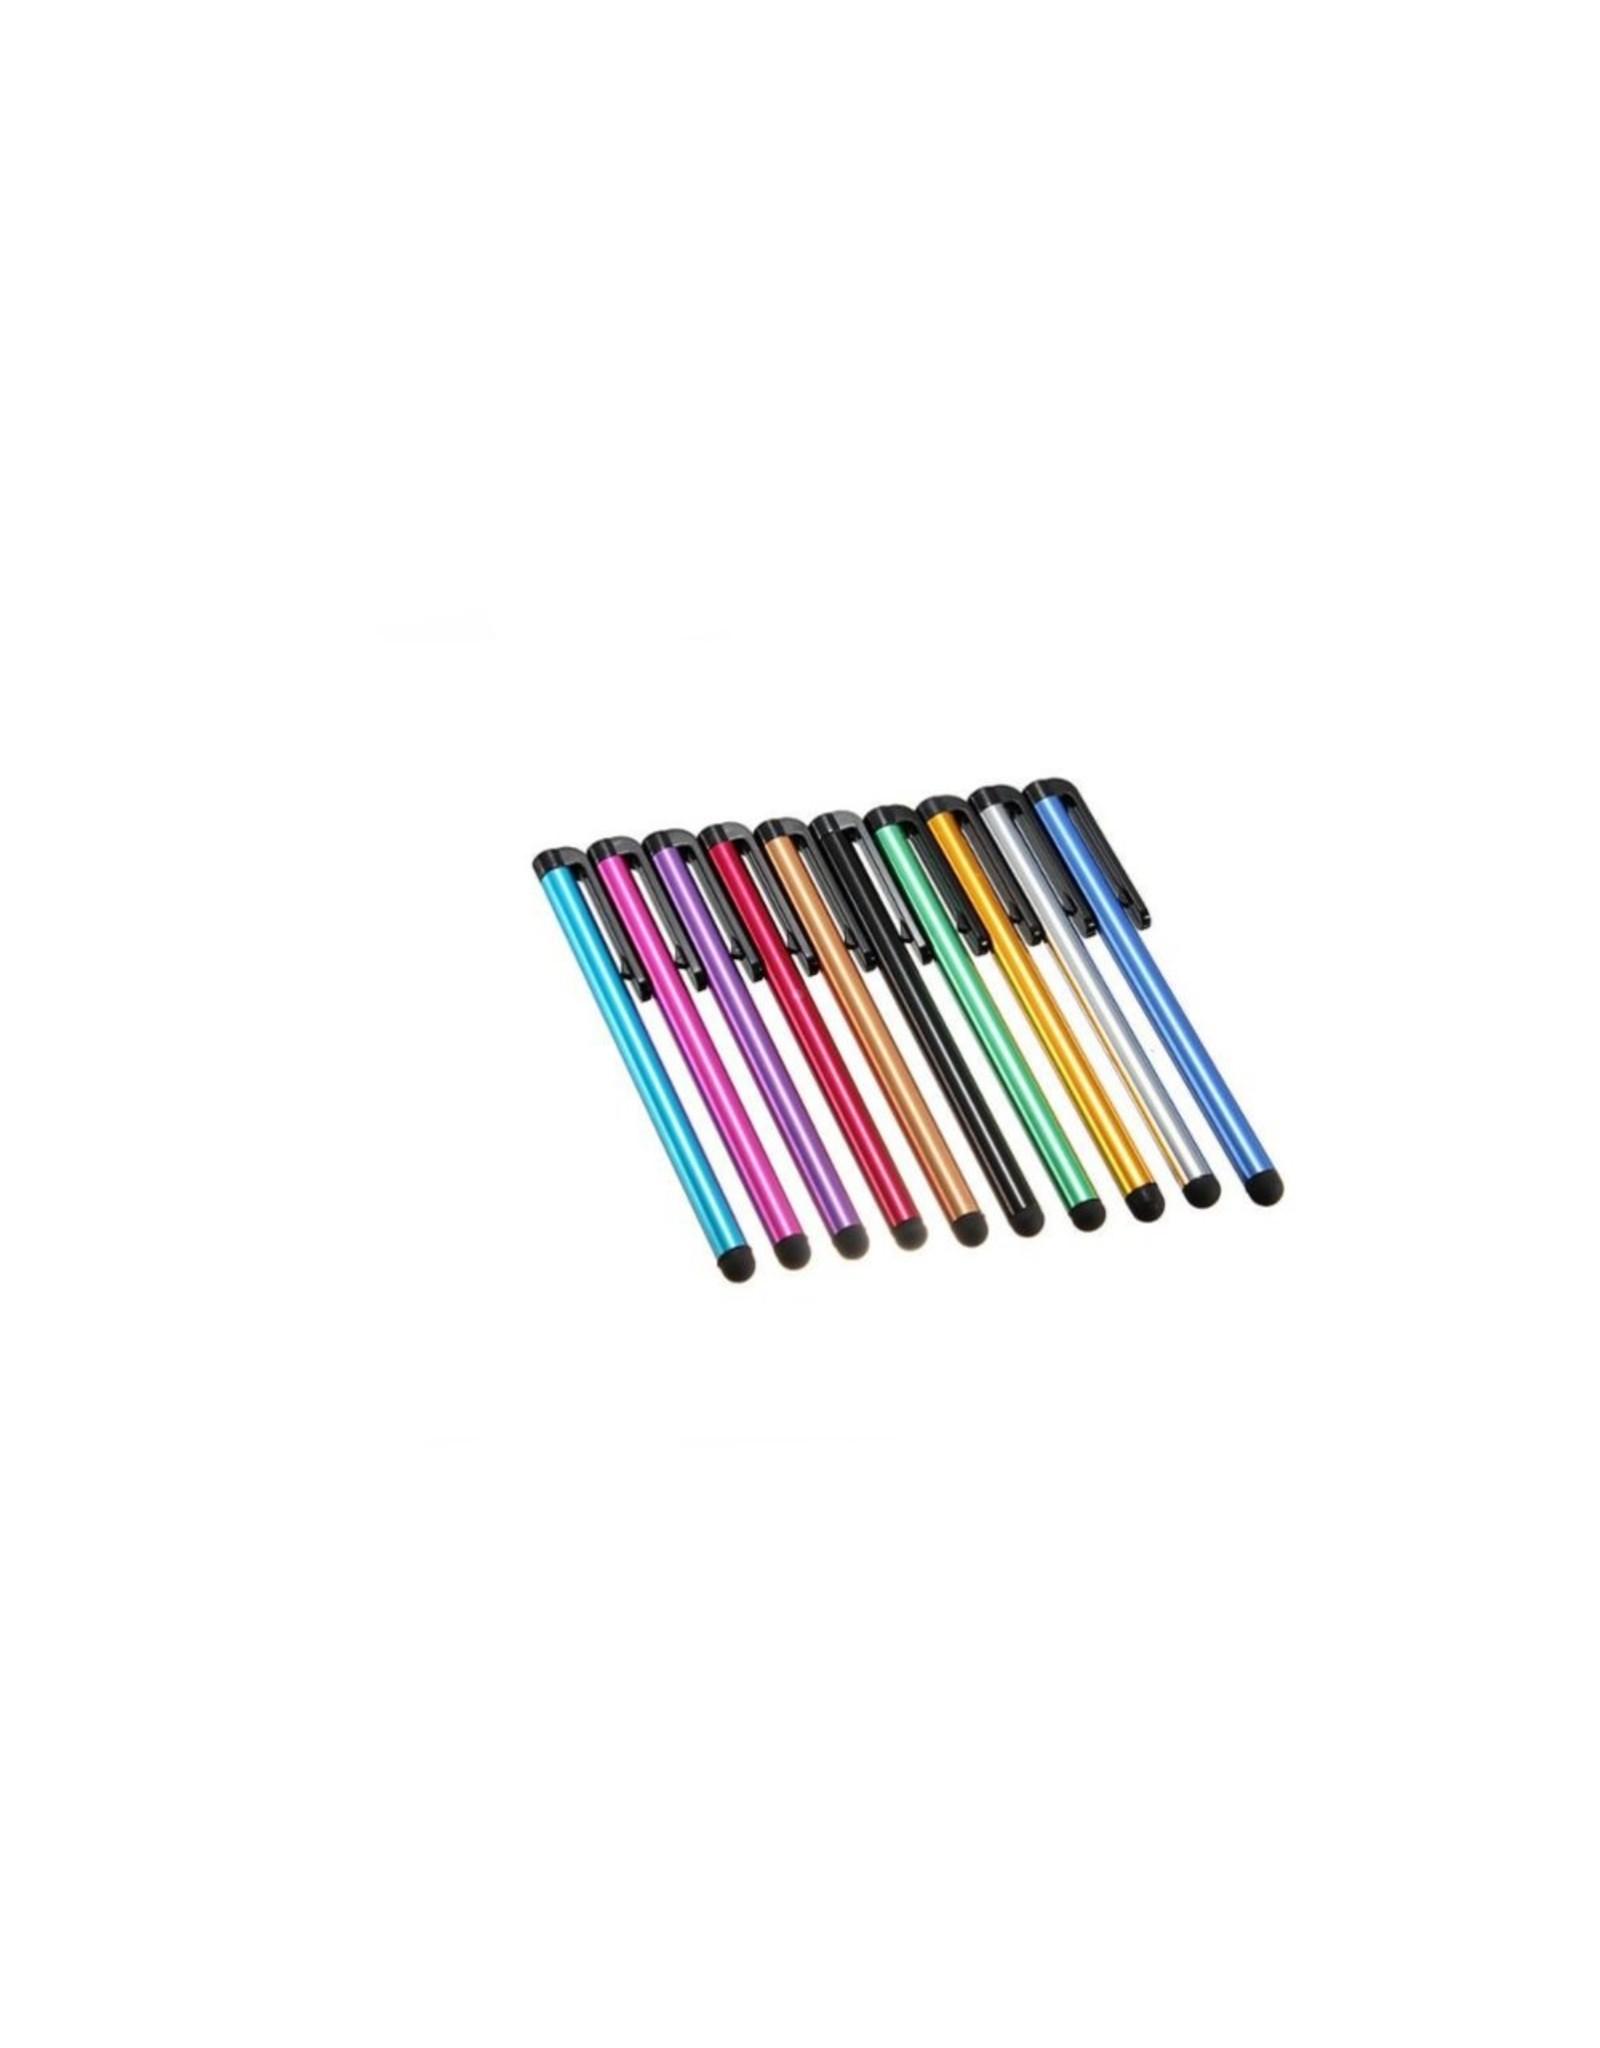 OEM Universal Tablet Stylus Pen